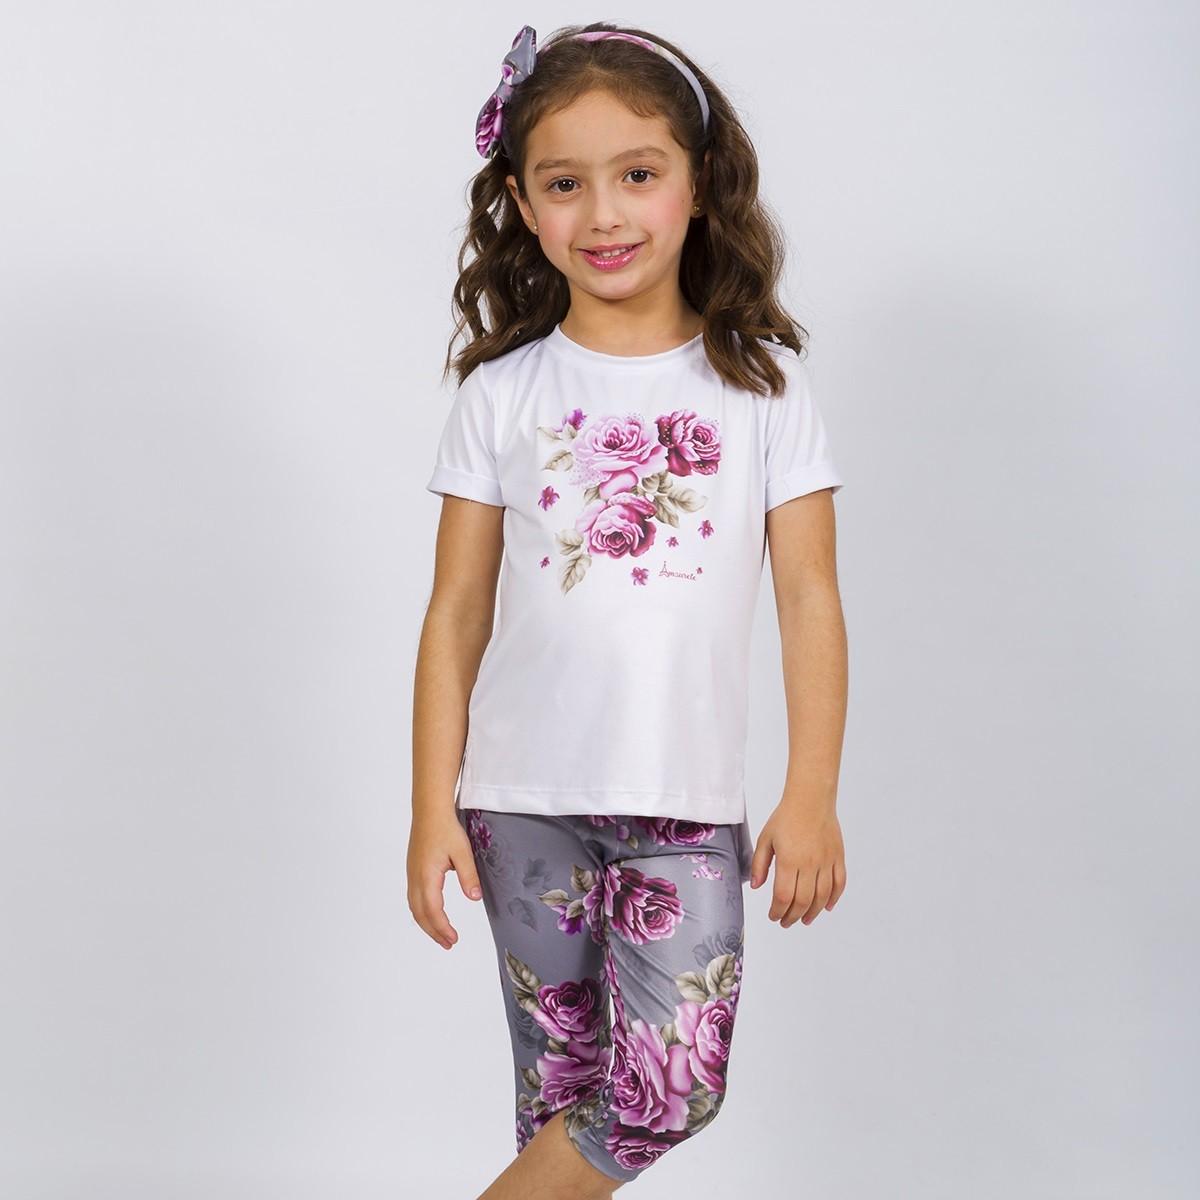 BAZAR - Conjunto Infantil Blusa e Legging Curta Rosas Cinza